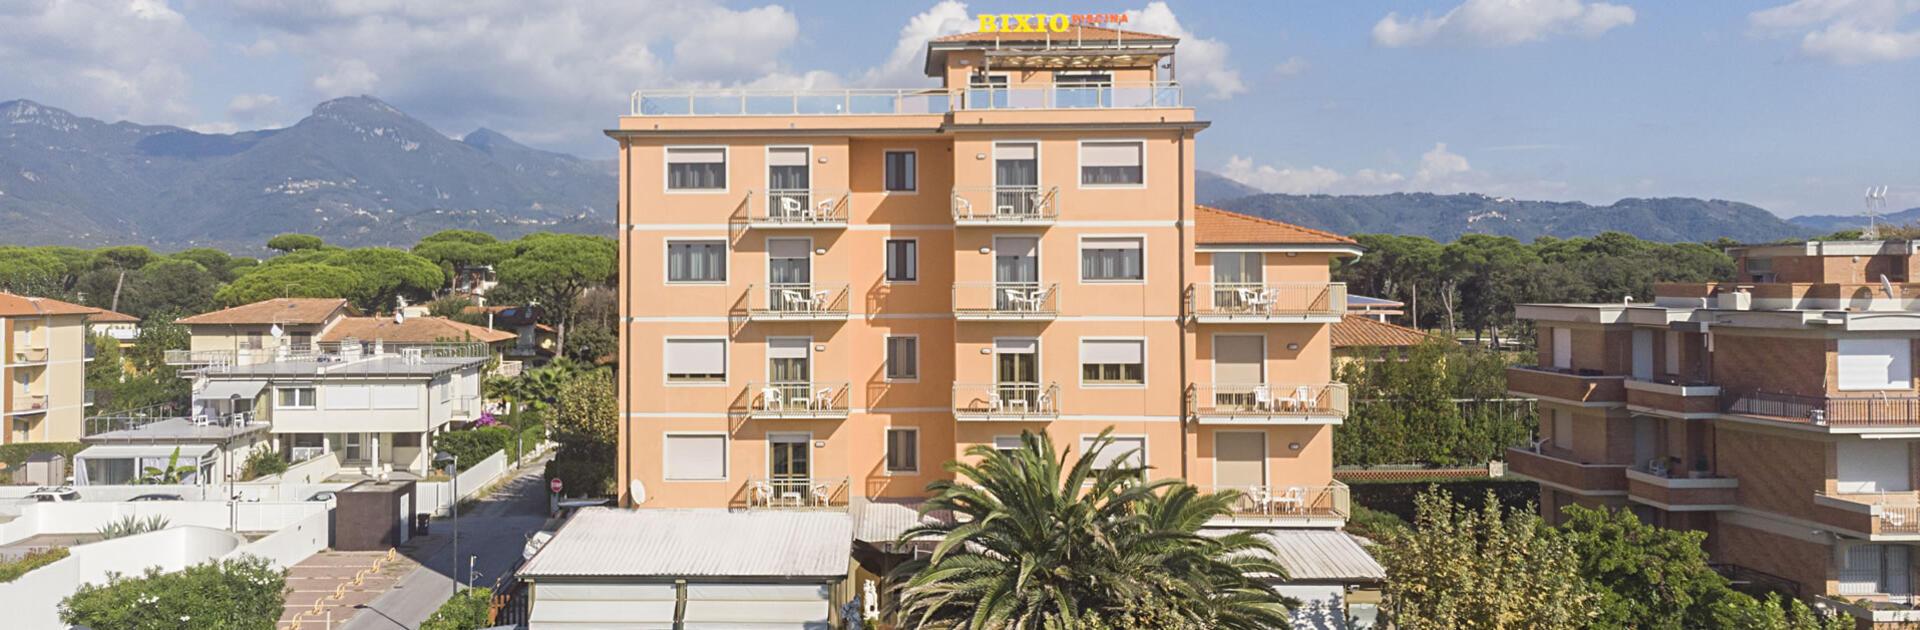 hotelbixio de hotel 009